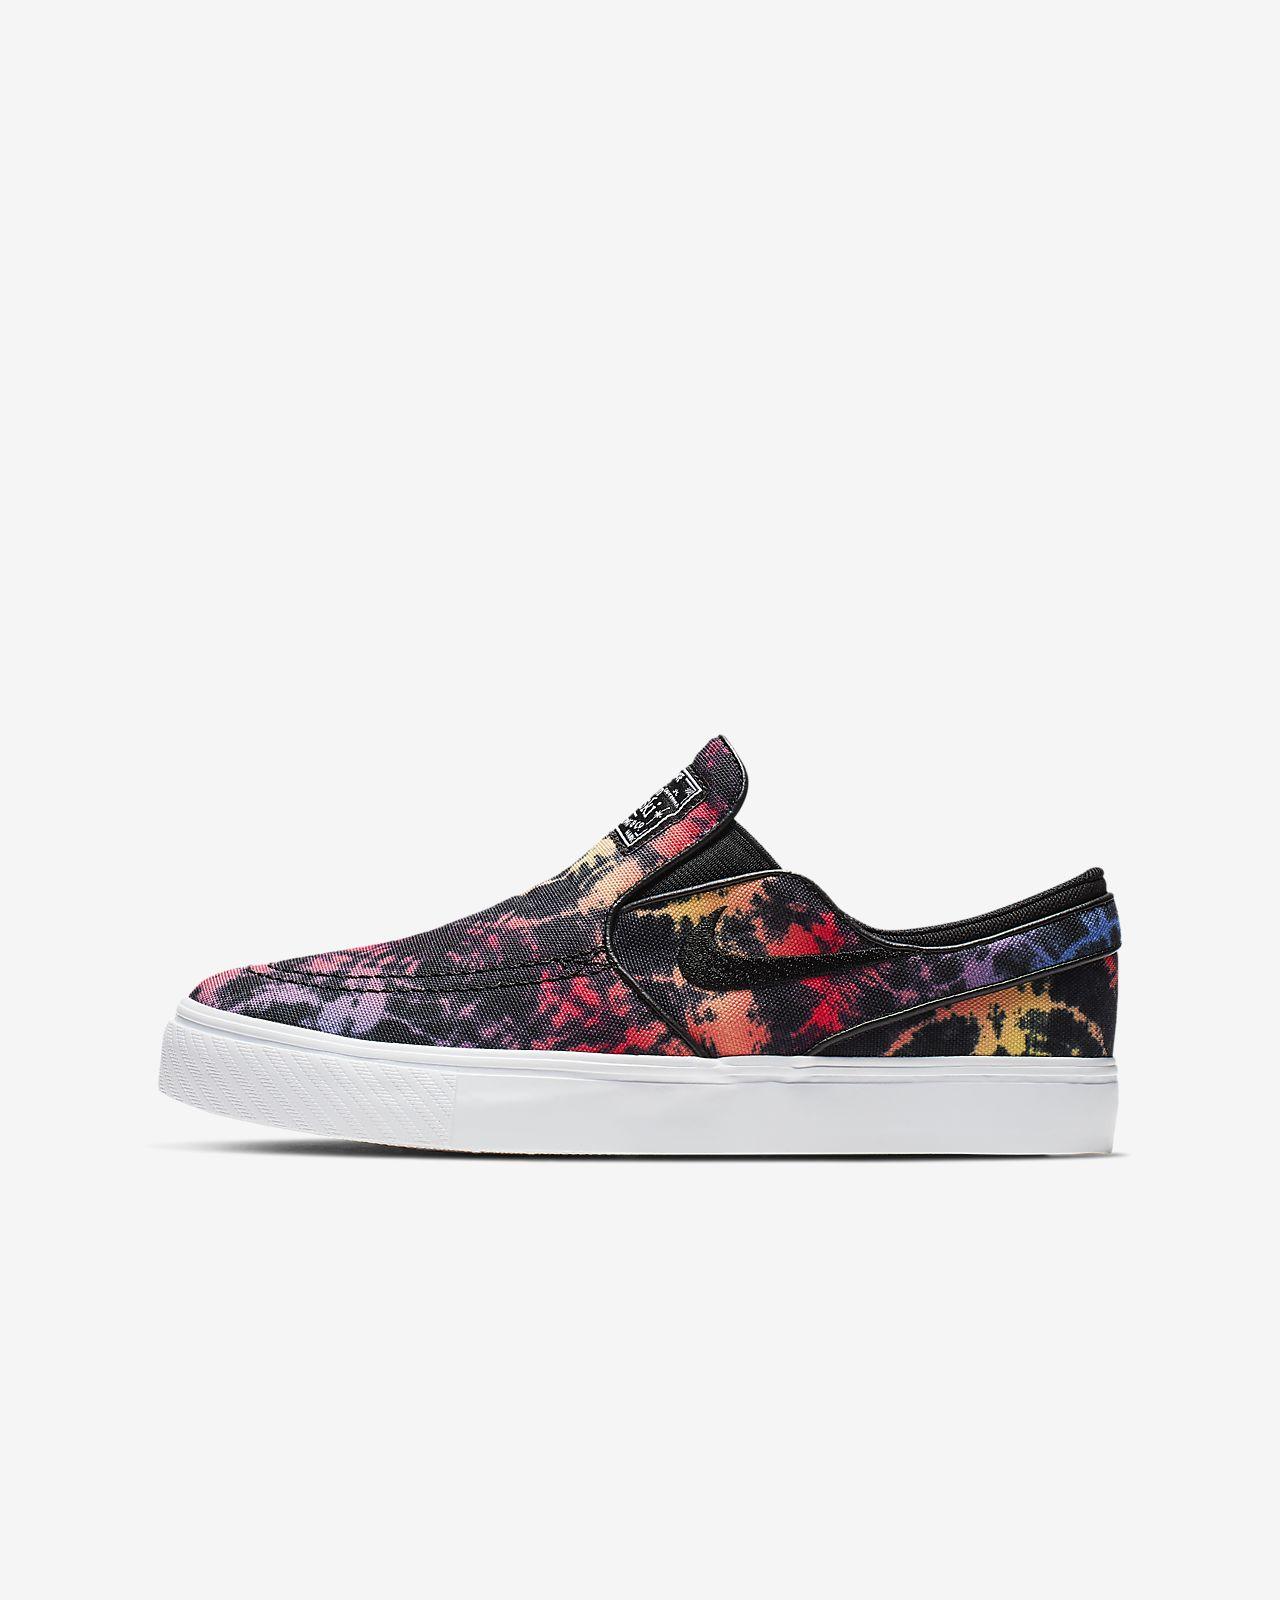 395da8100e2 ... Sapatilhas de skateboard Nike SB Stefan Janoski Canvas Slip Tie Dye  Júnior